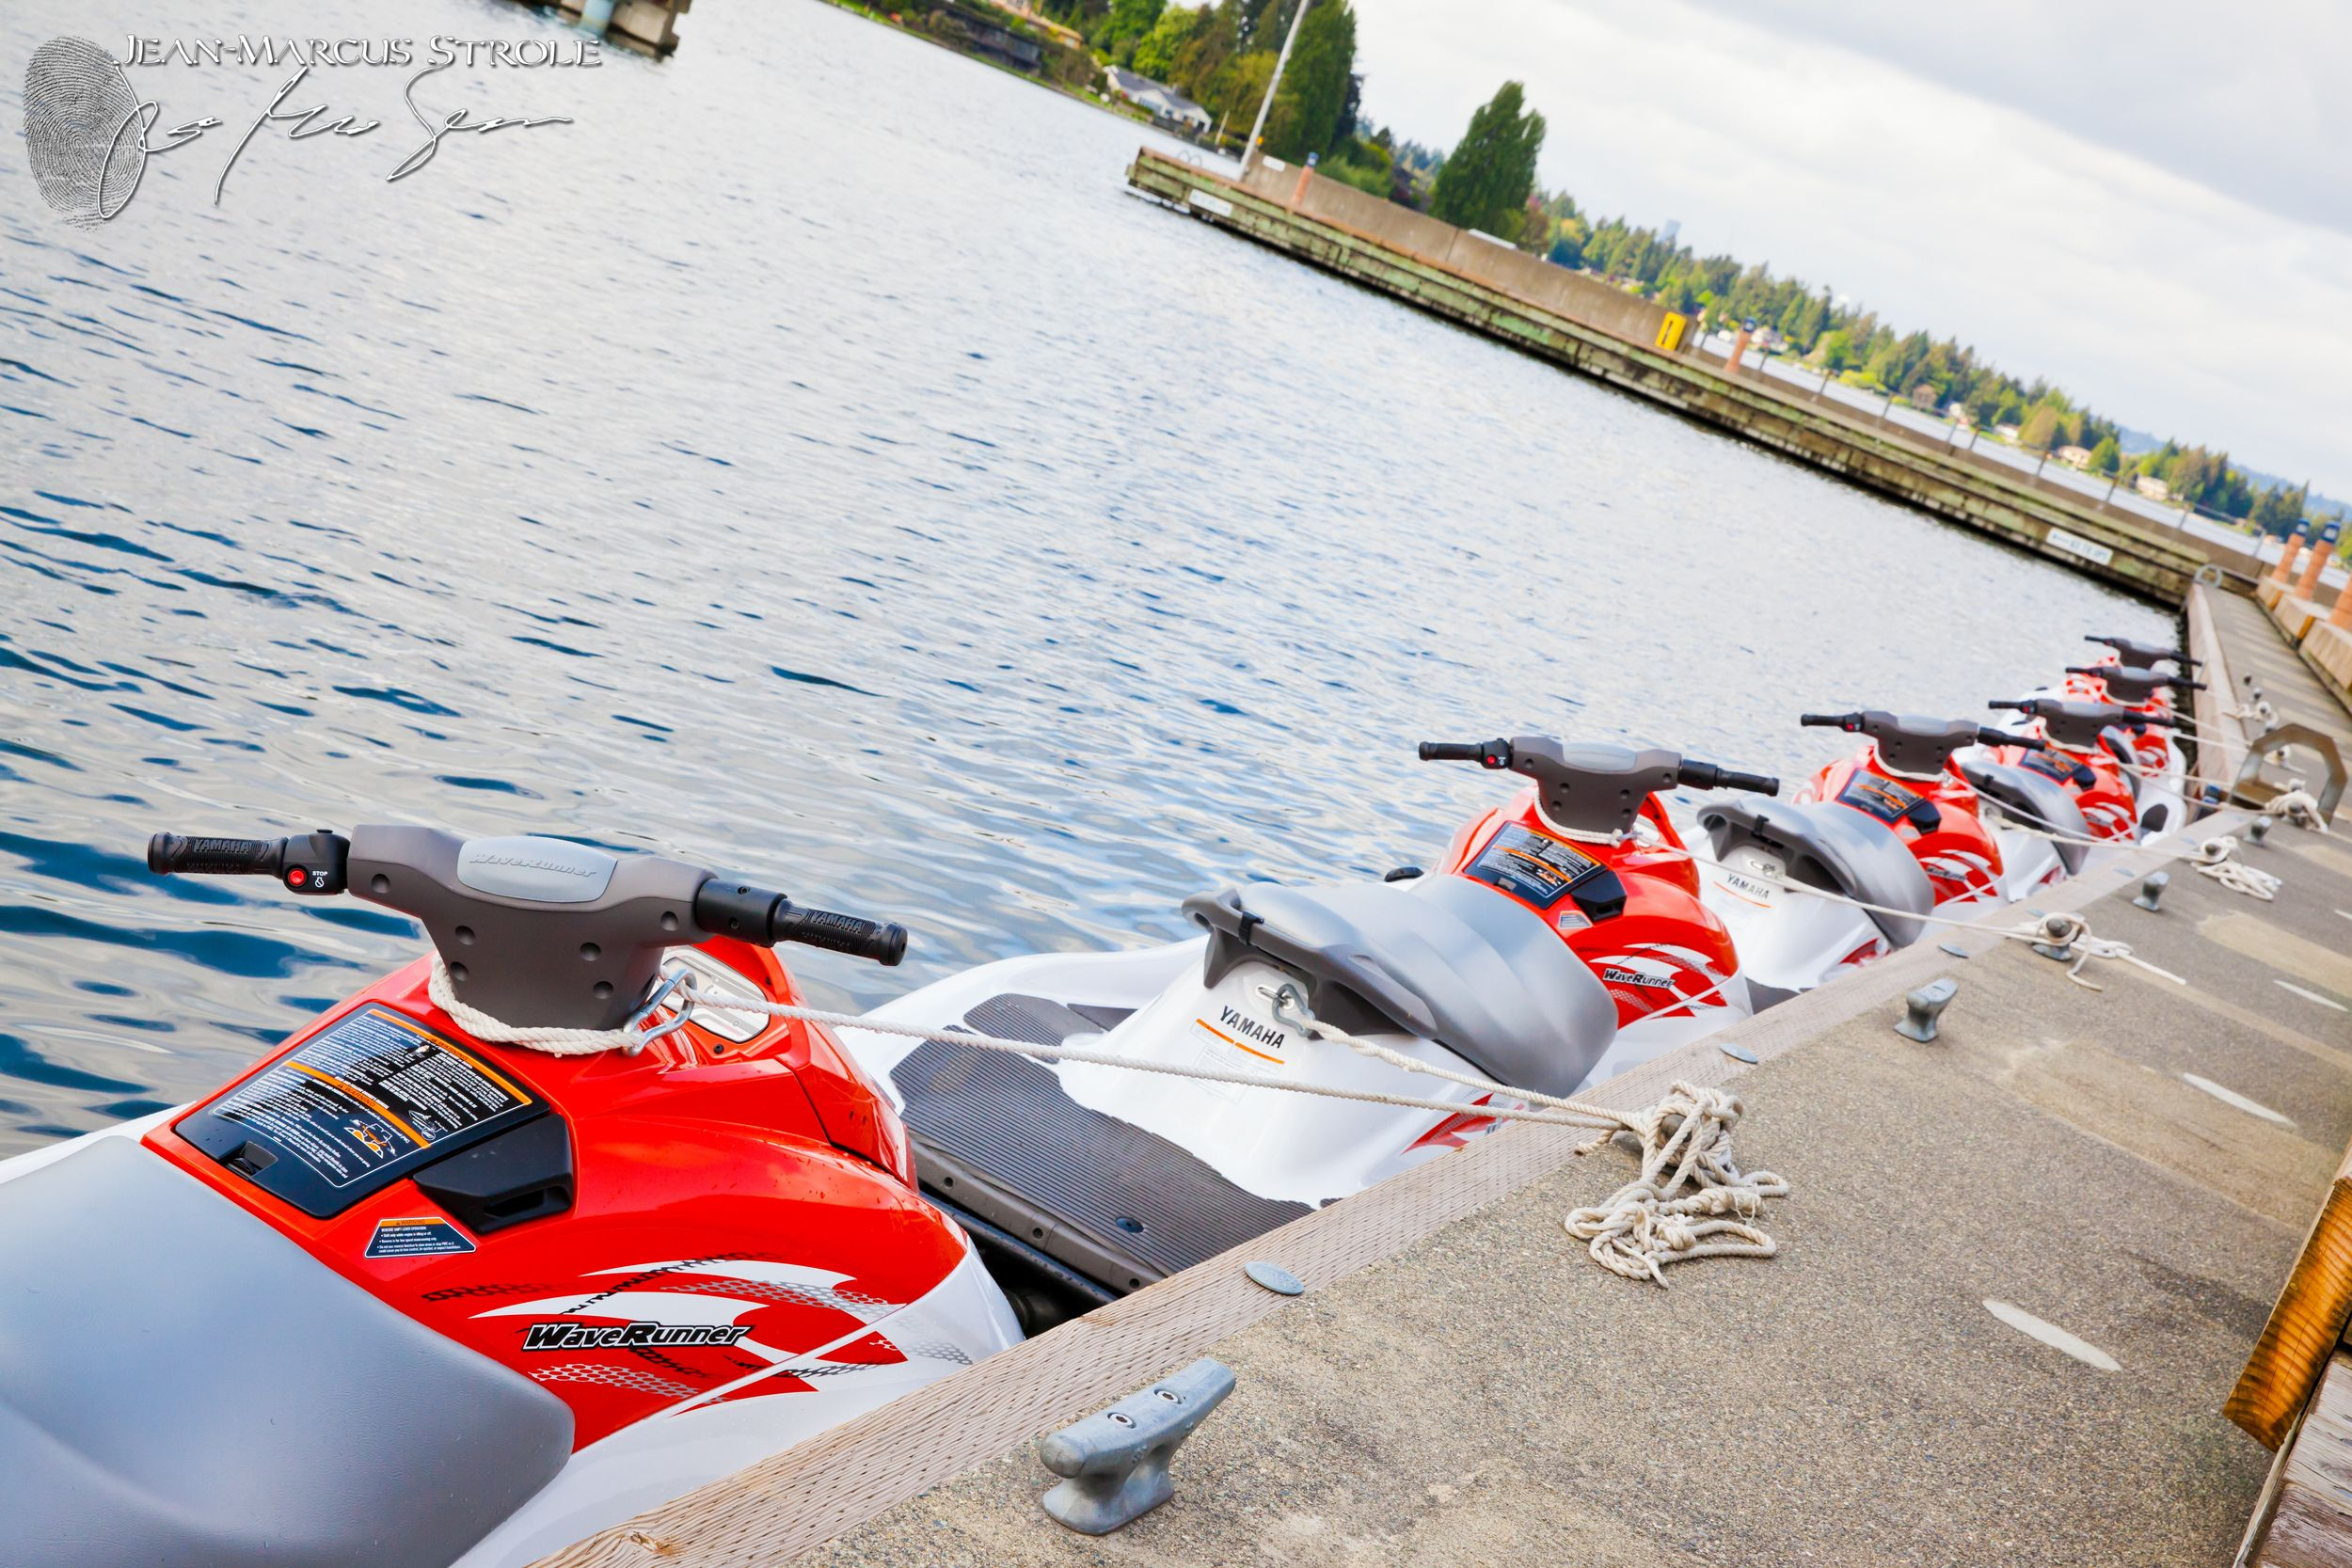 Rent a jet ski at carillon point via waterfront adventures